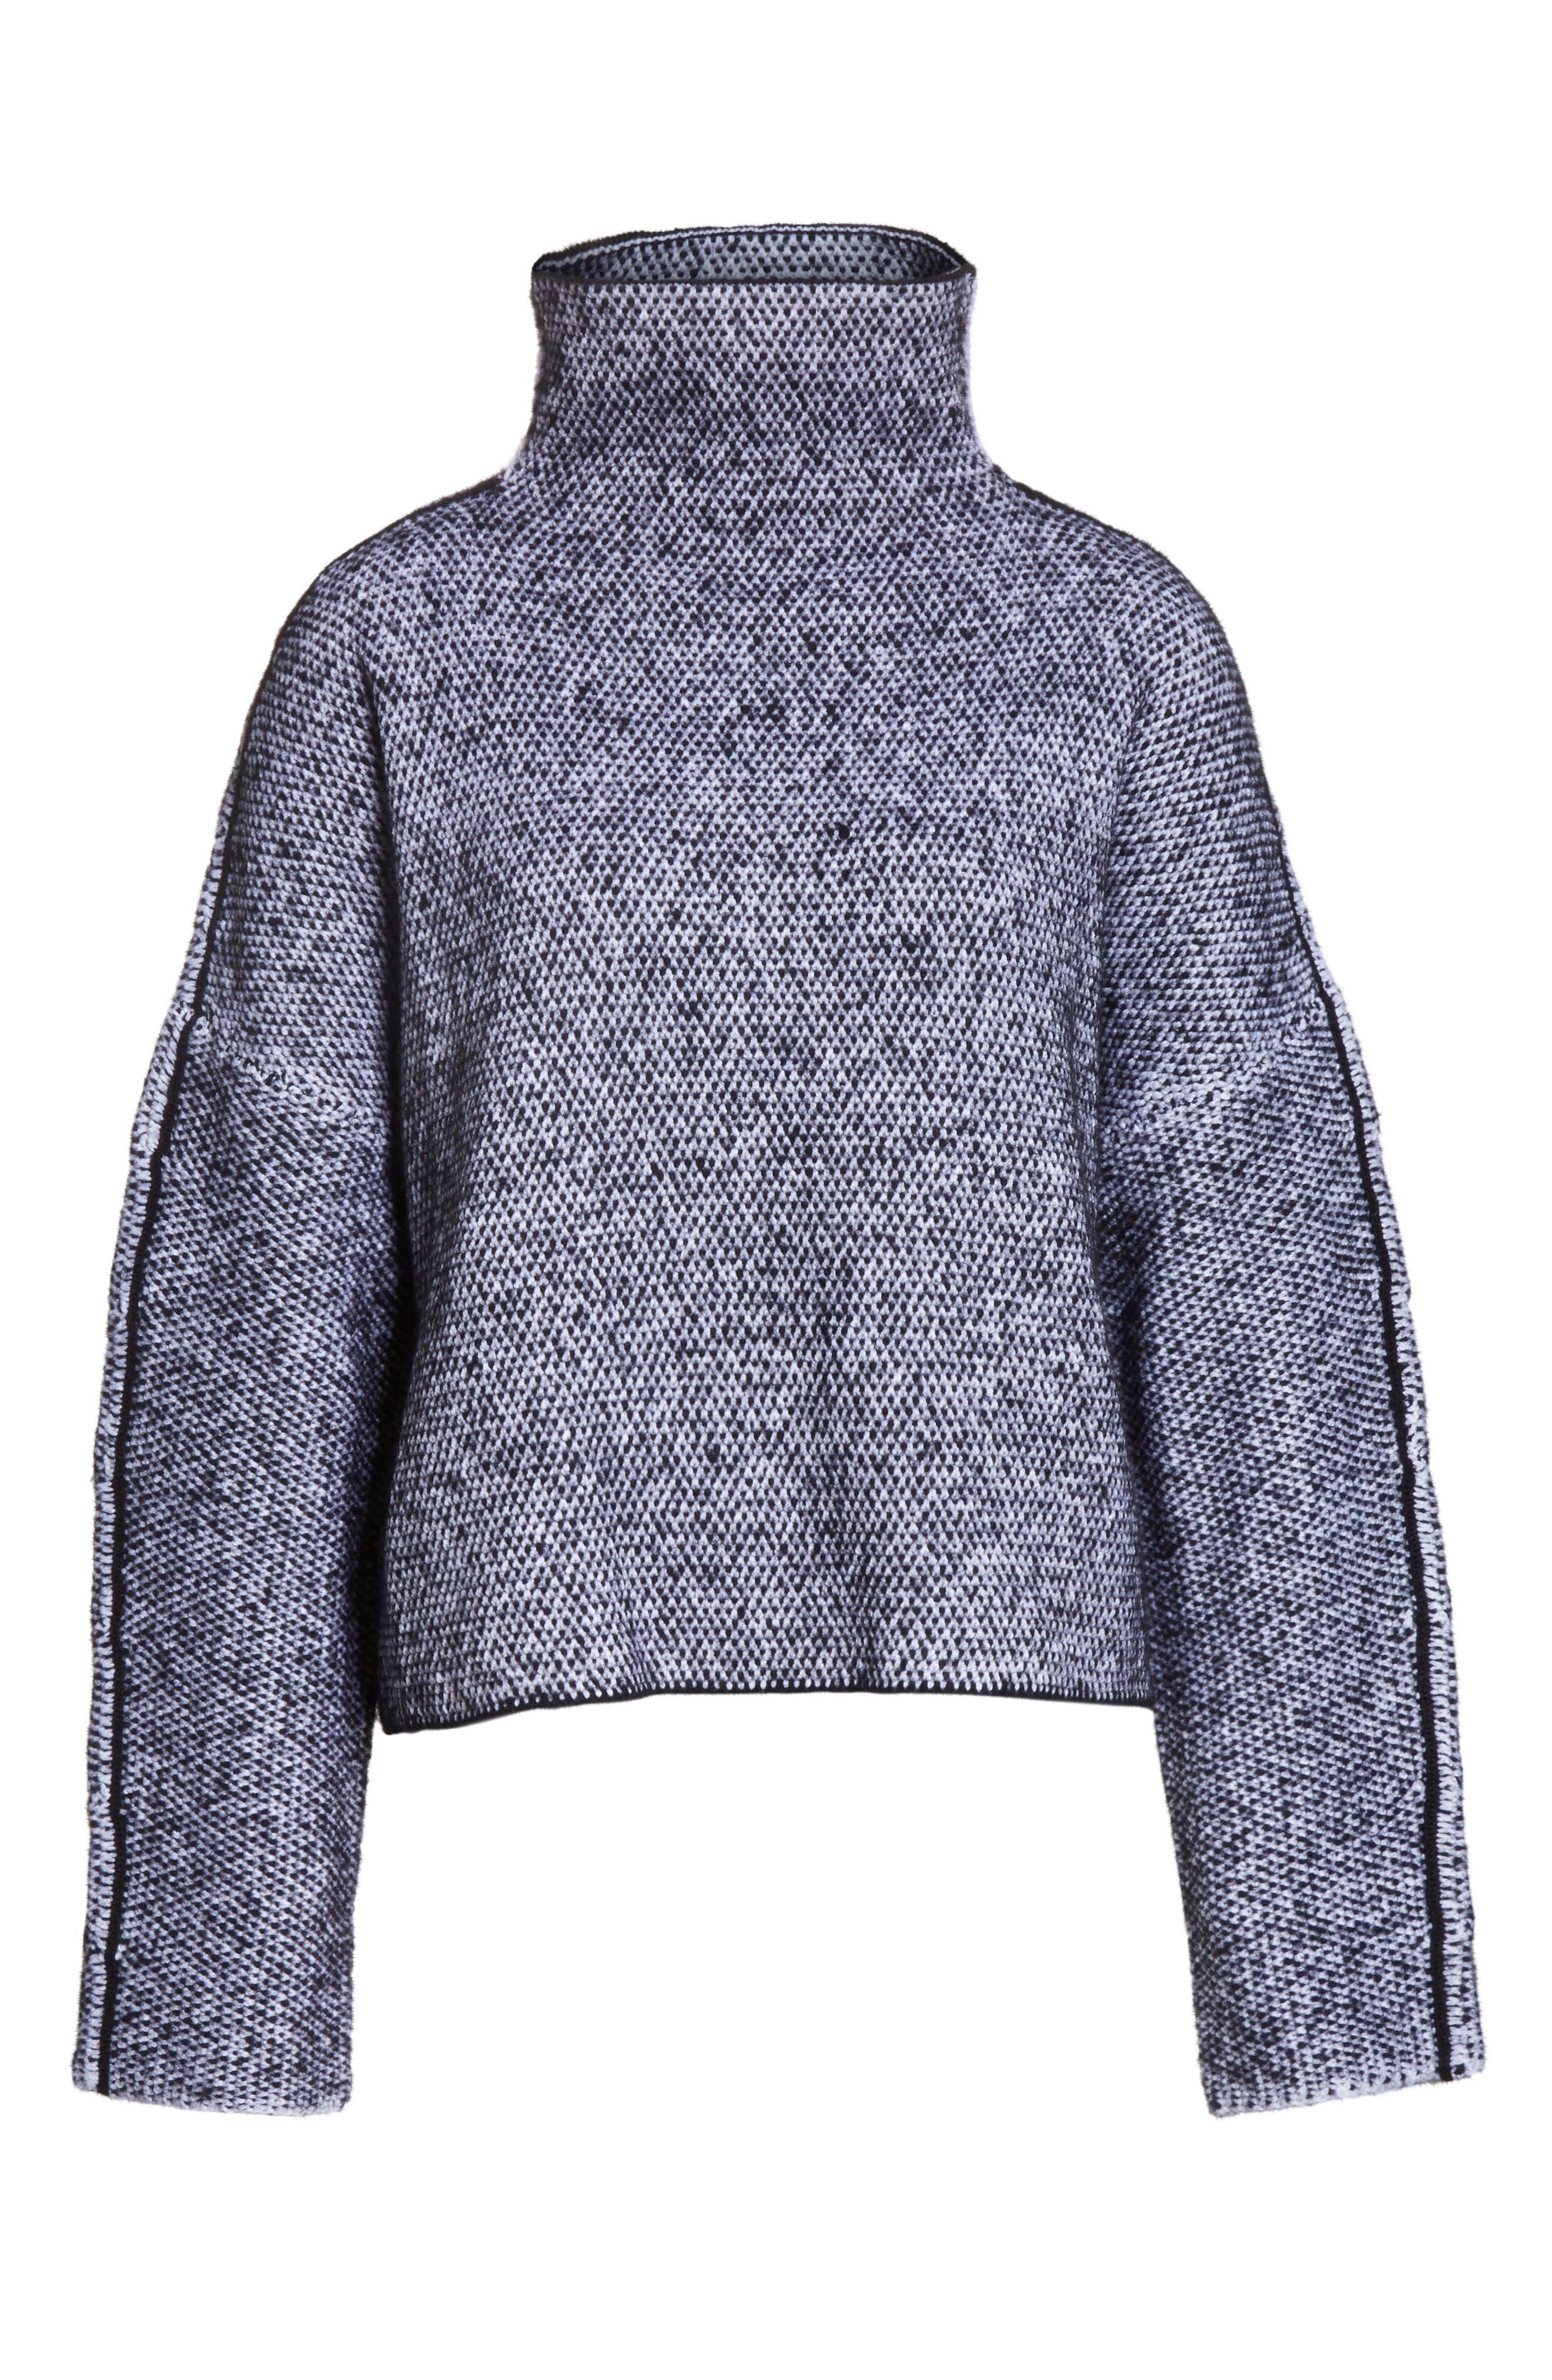 Robin Merino Wool Blend Sweater,                             Alternate thumbnail 6, color,